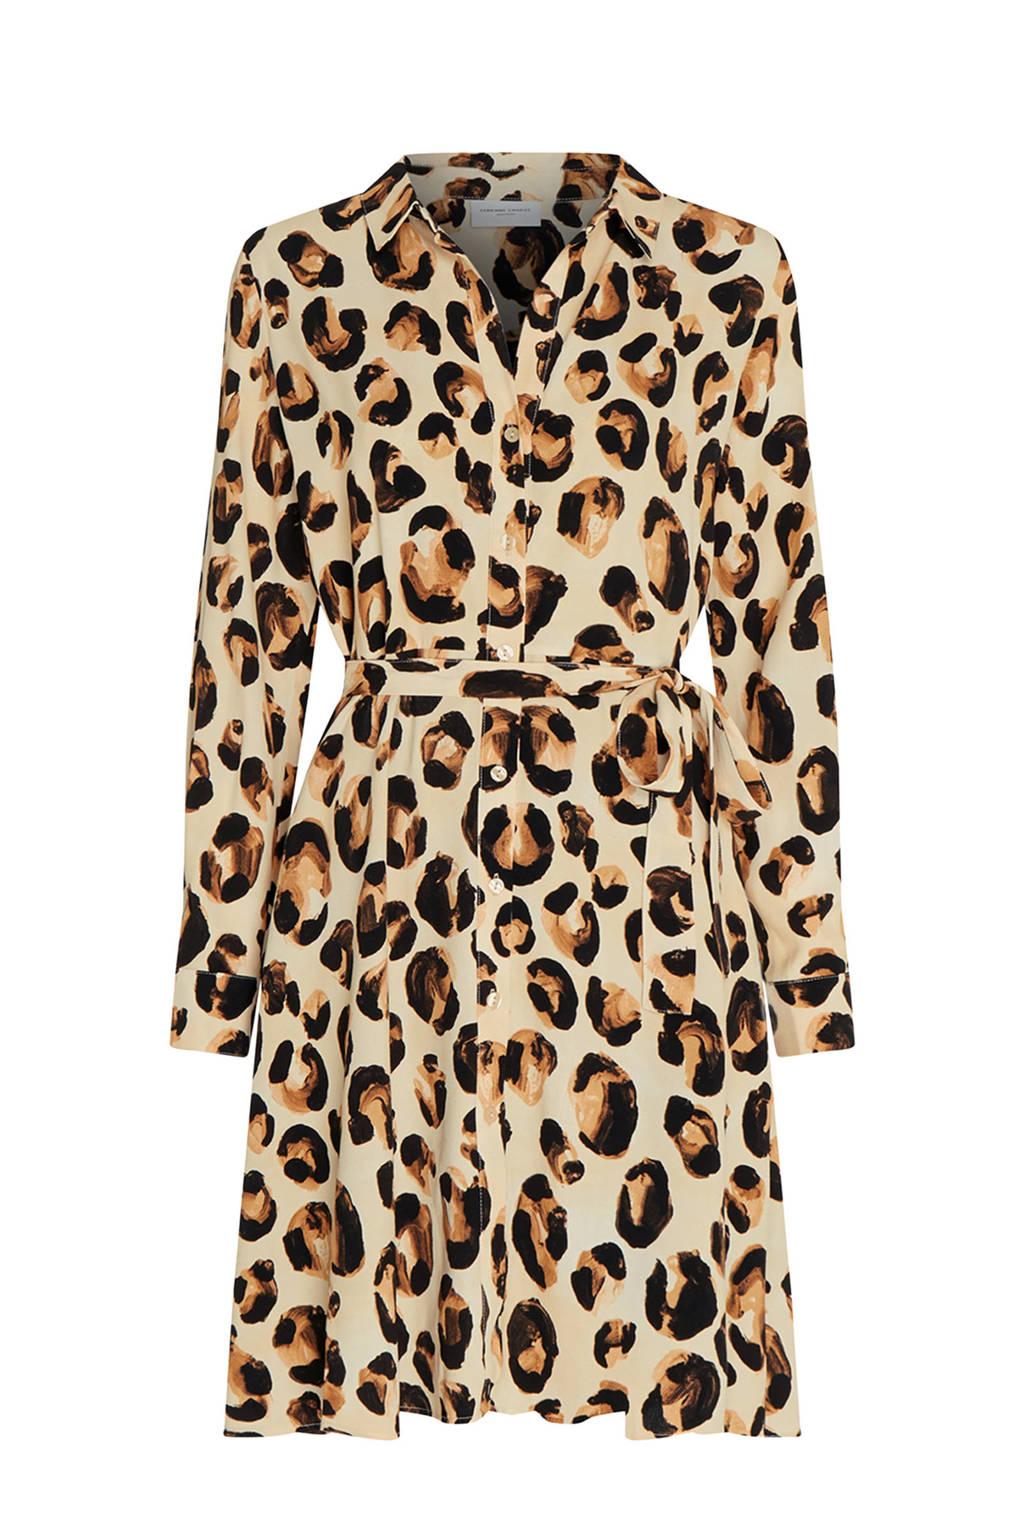 Fabienne Chapot blousejurk Dorien met dierenprint lichtgeel/bruin/zwart, Lichtgeel/bruin/zwart